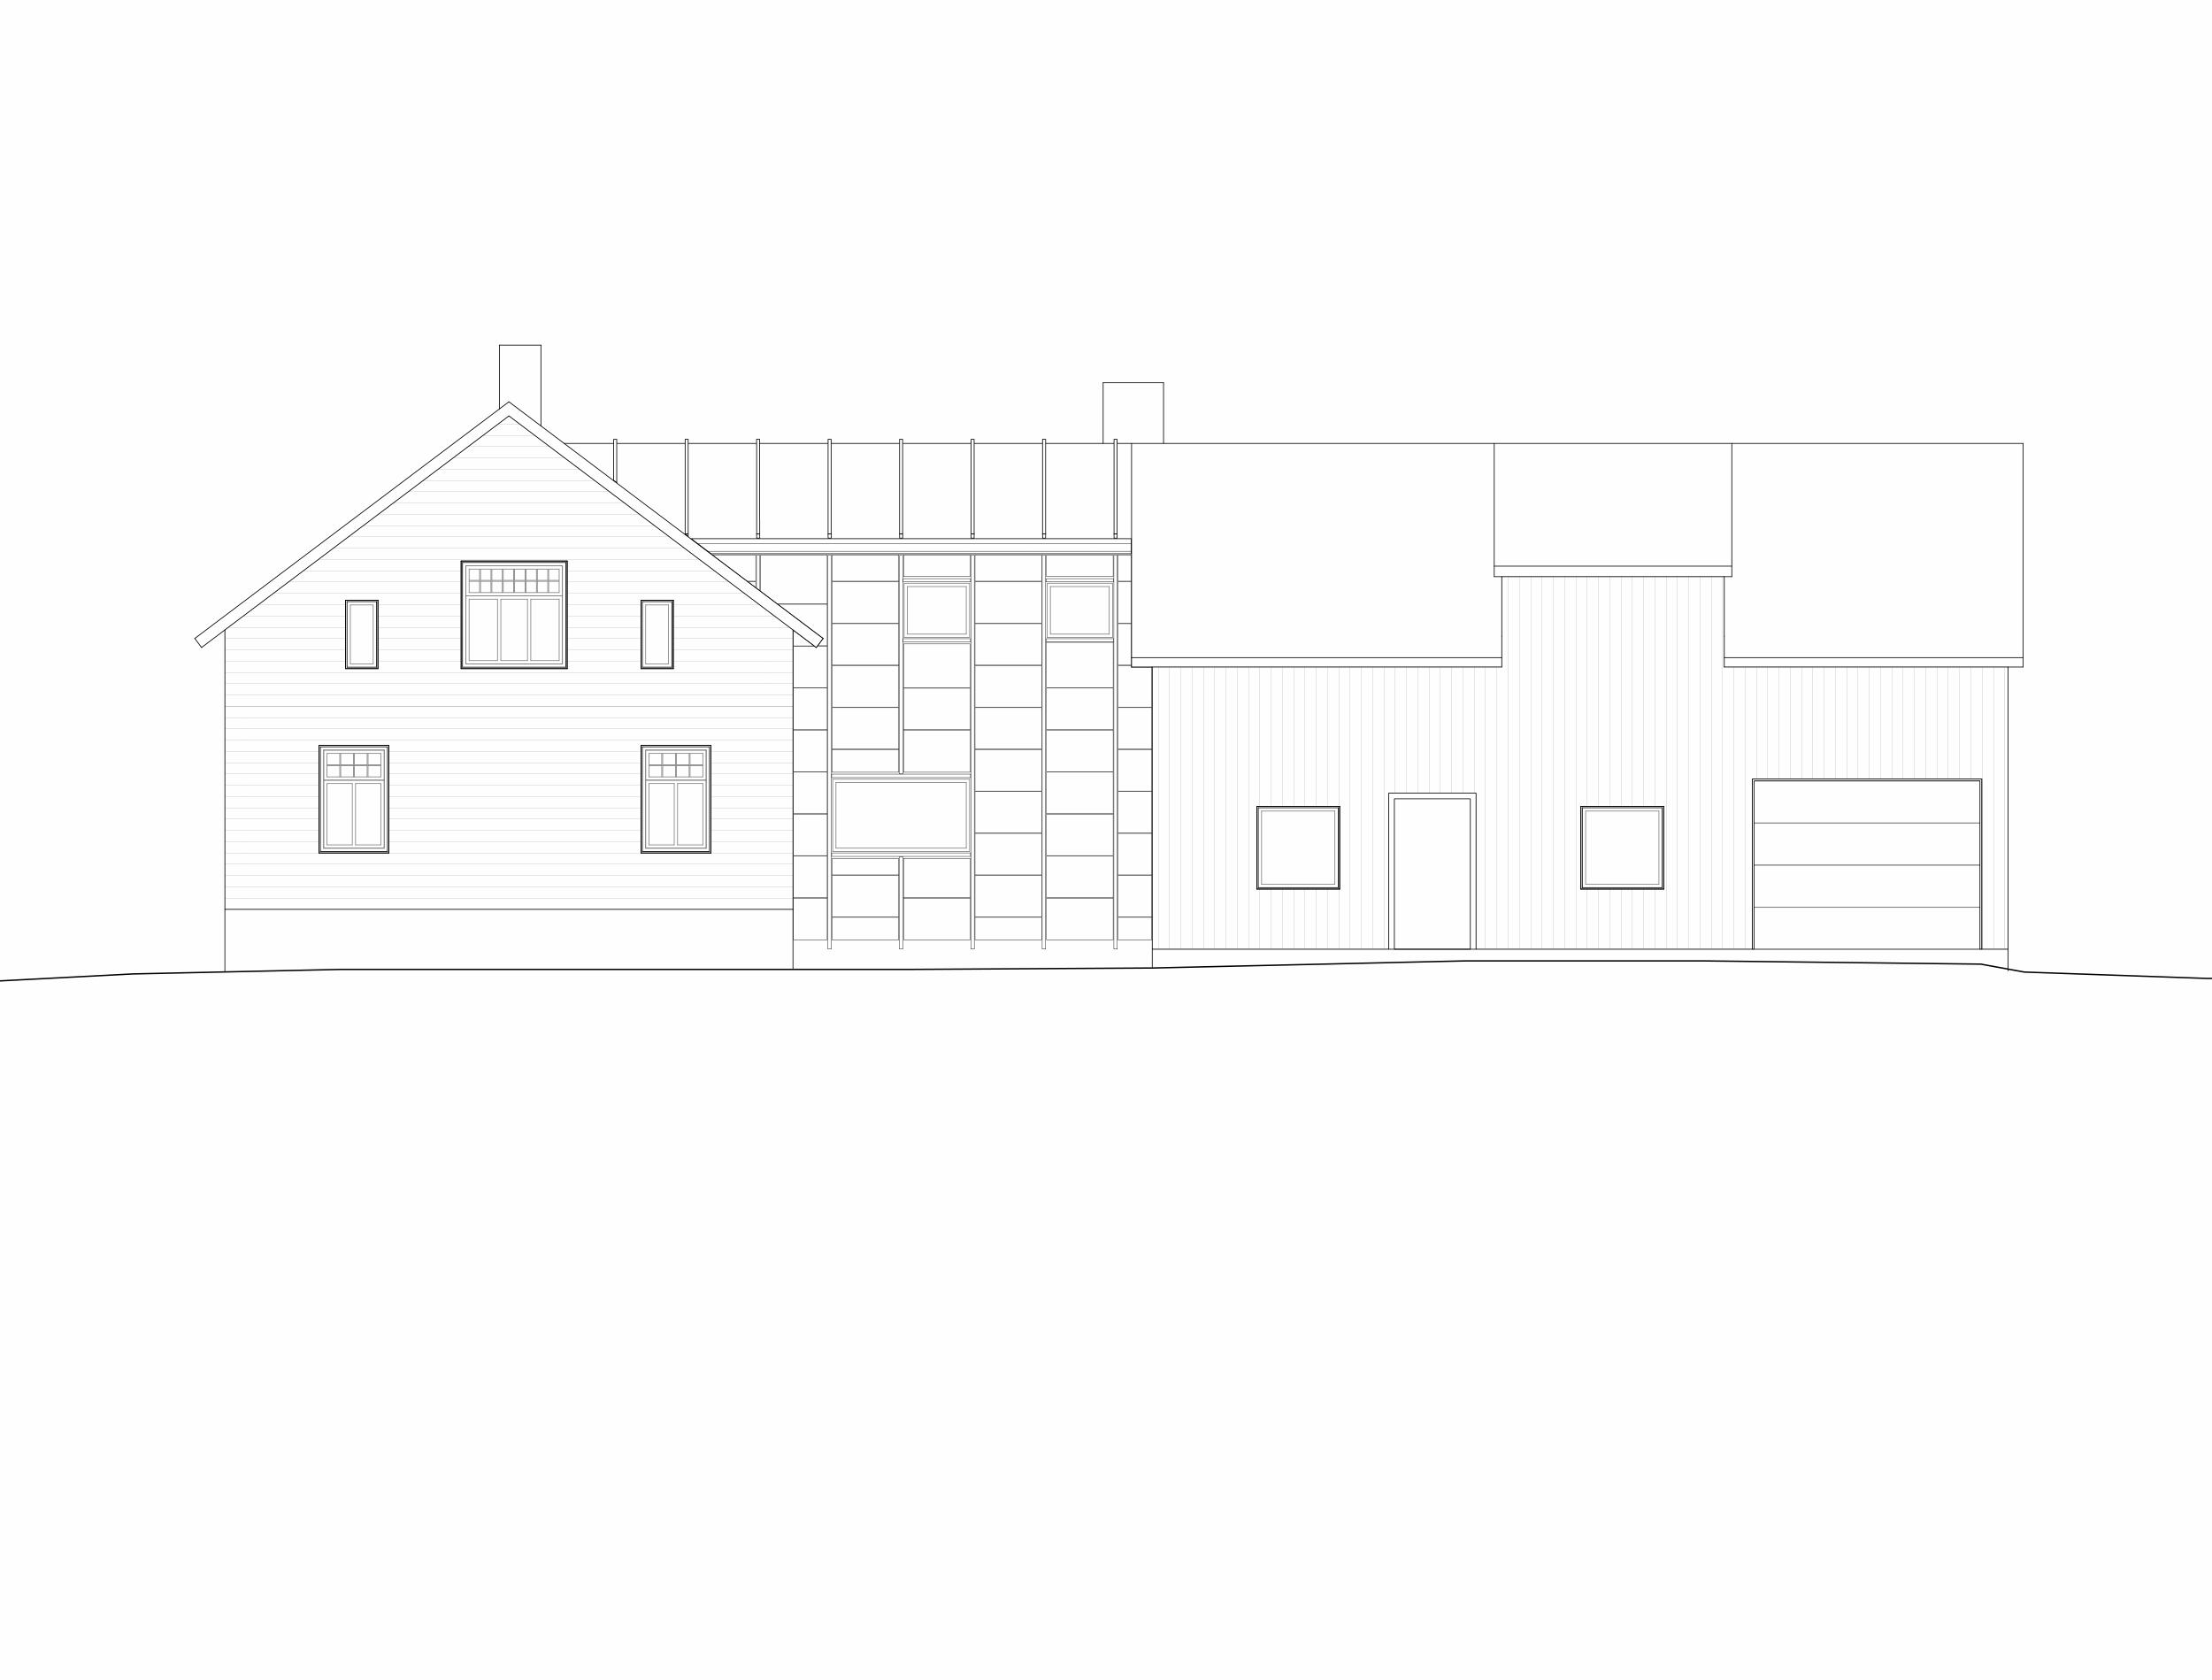 Forunderlig Arkitektur - 1604 - Fasade Øst